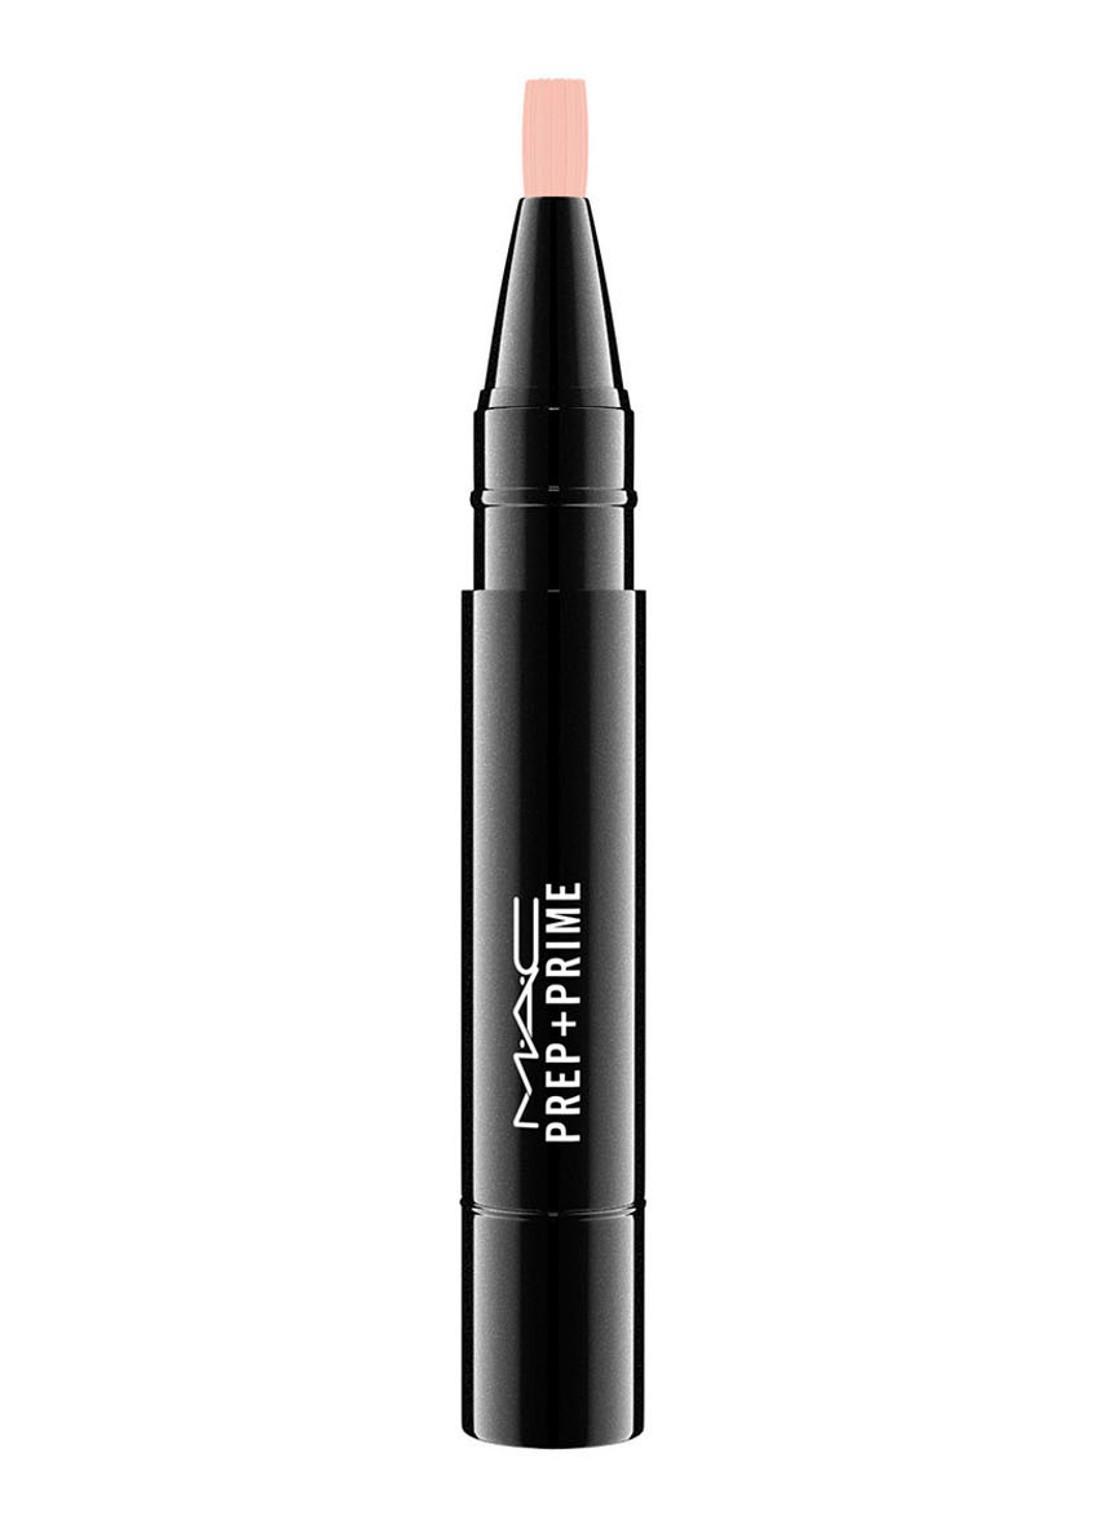 Stylo Highlighter Prep + Prime de M.A.C Cosmetics